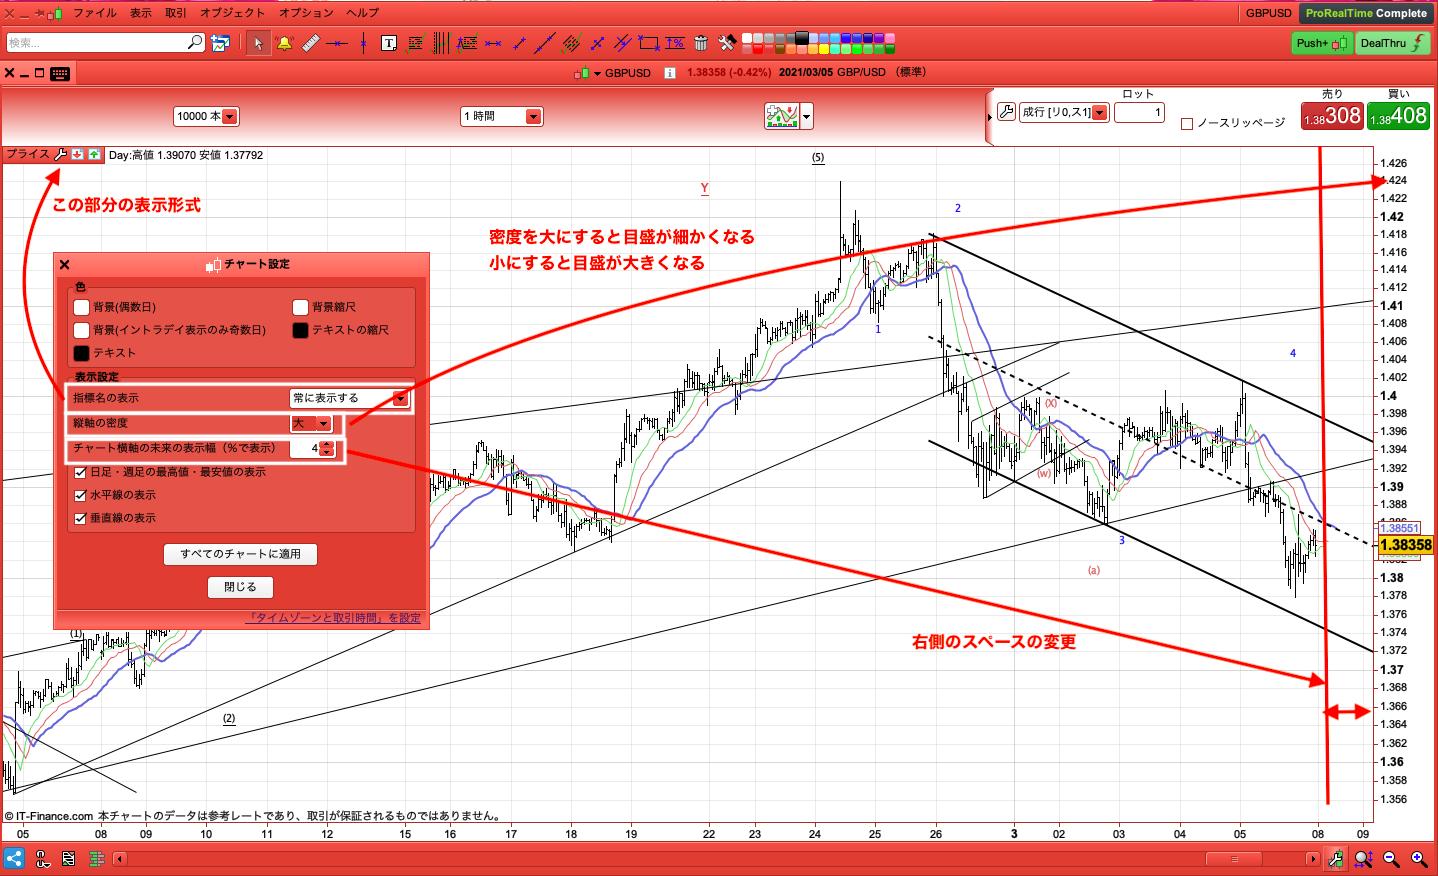 IG証券 ProRealTime チャート チャート設定